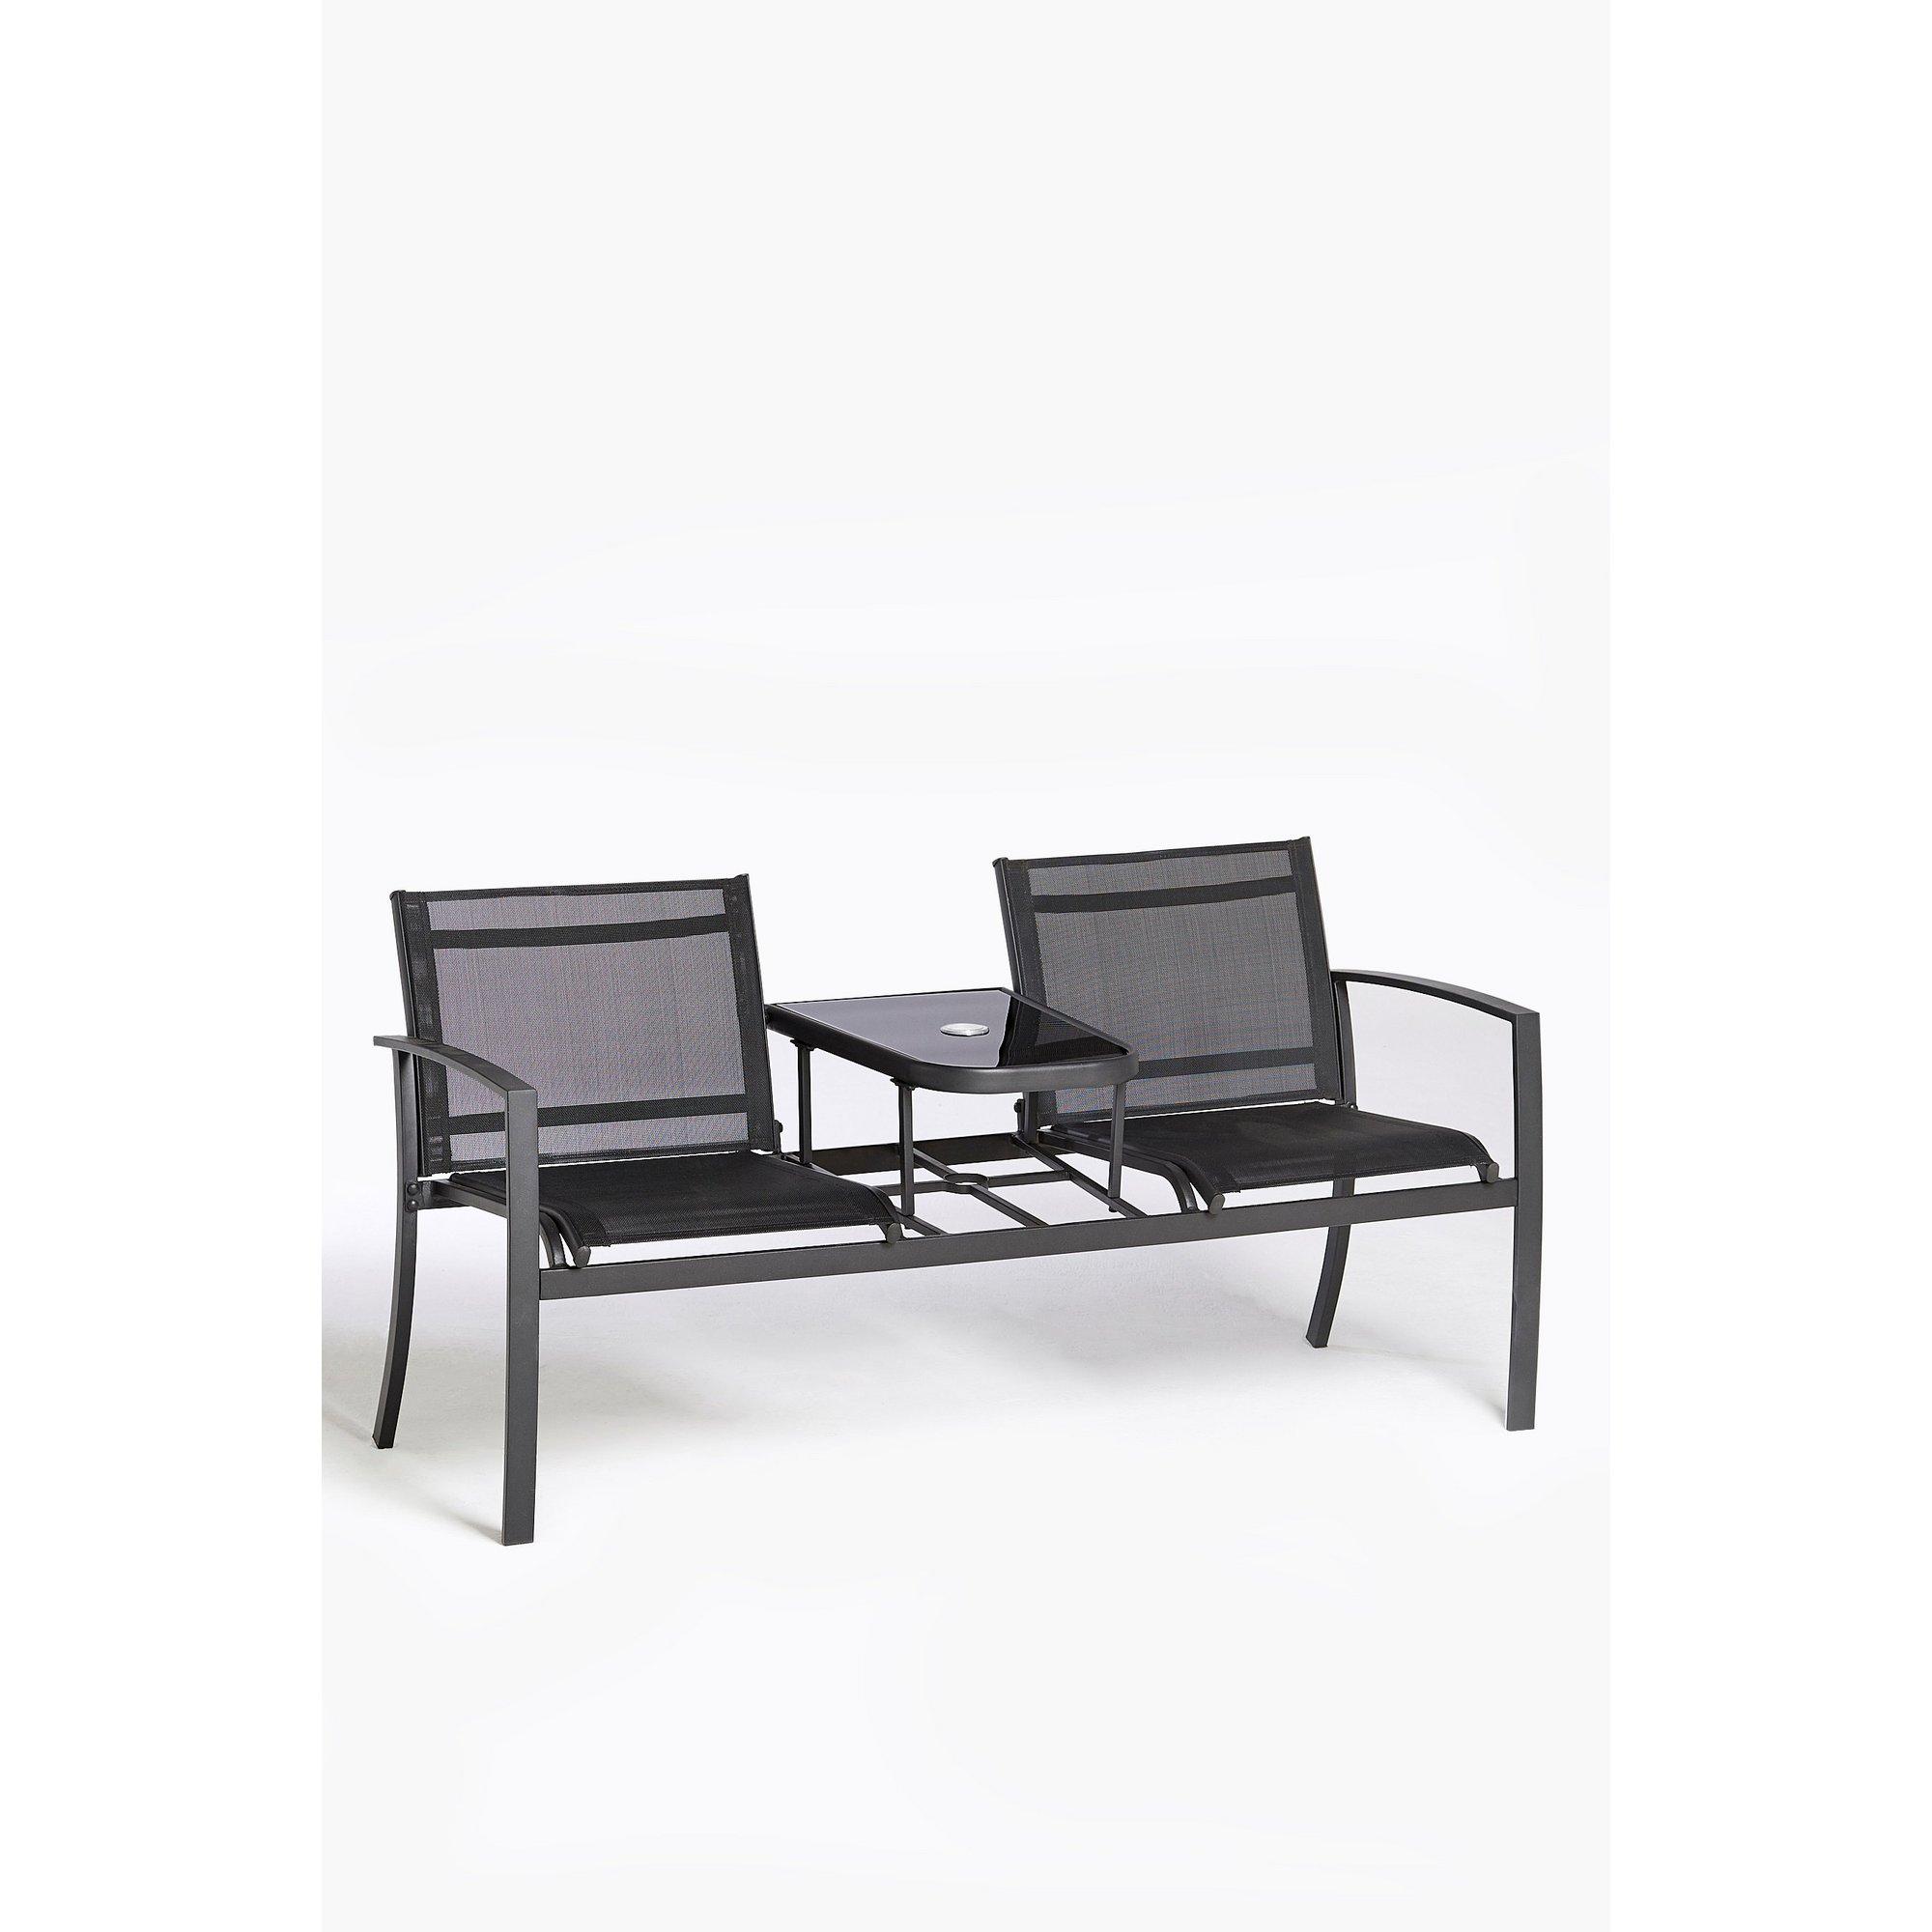 Image of Glendale Textilene 2 Seater Love Seat